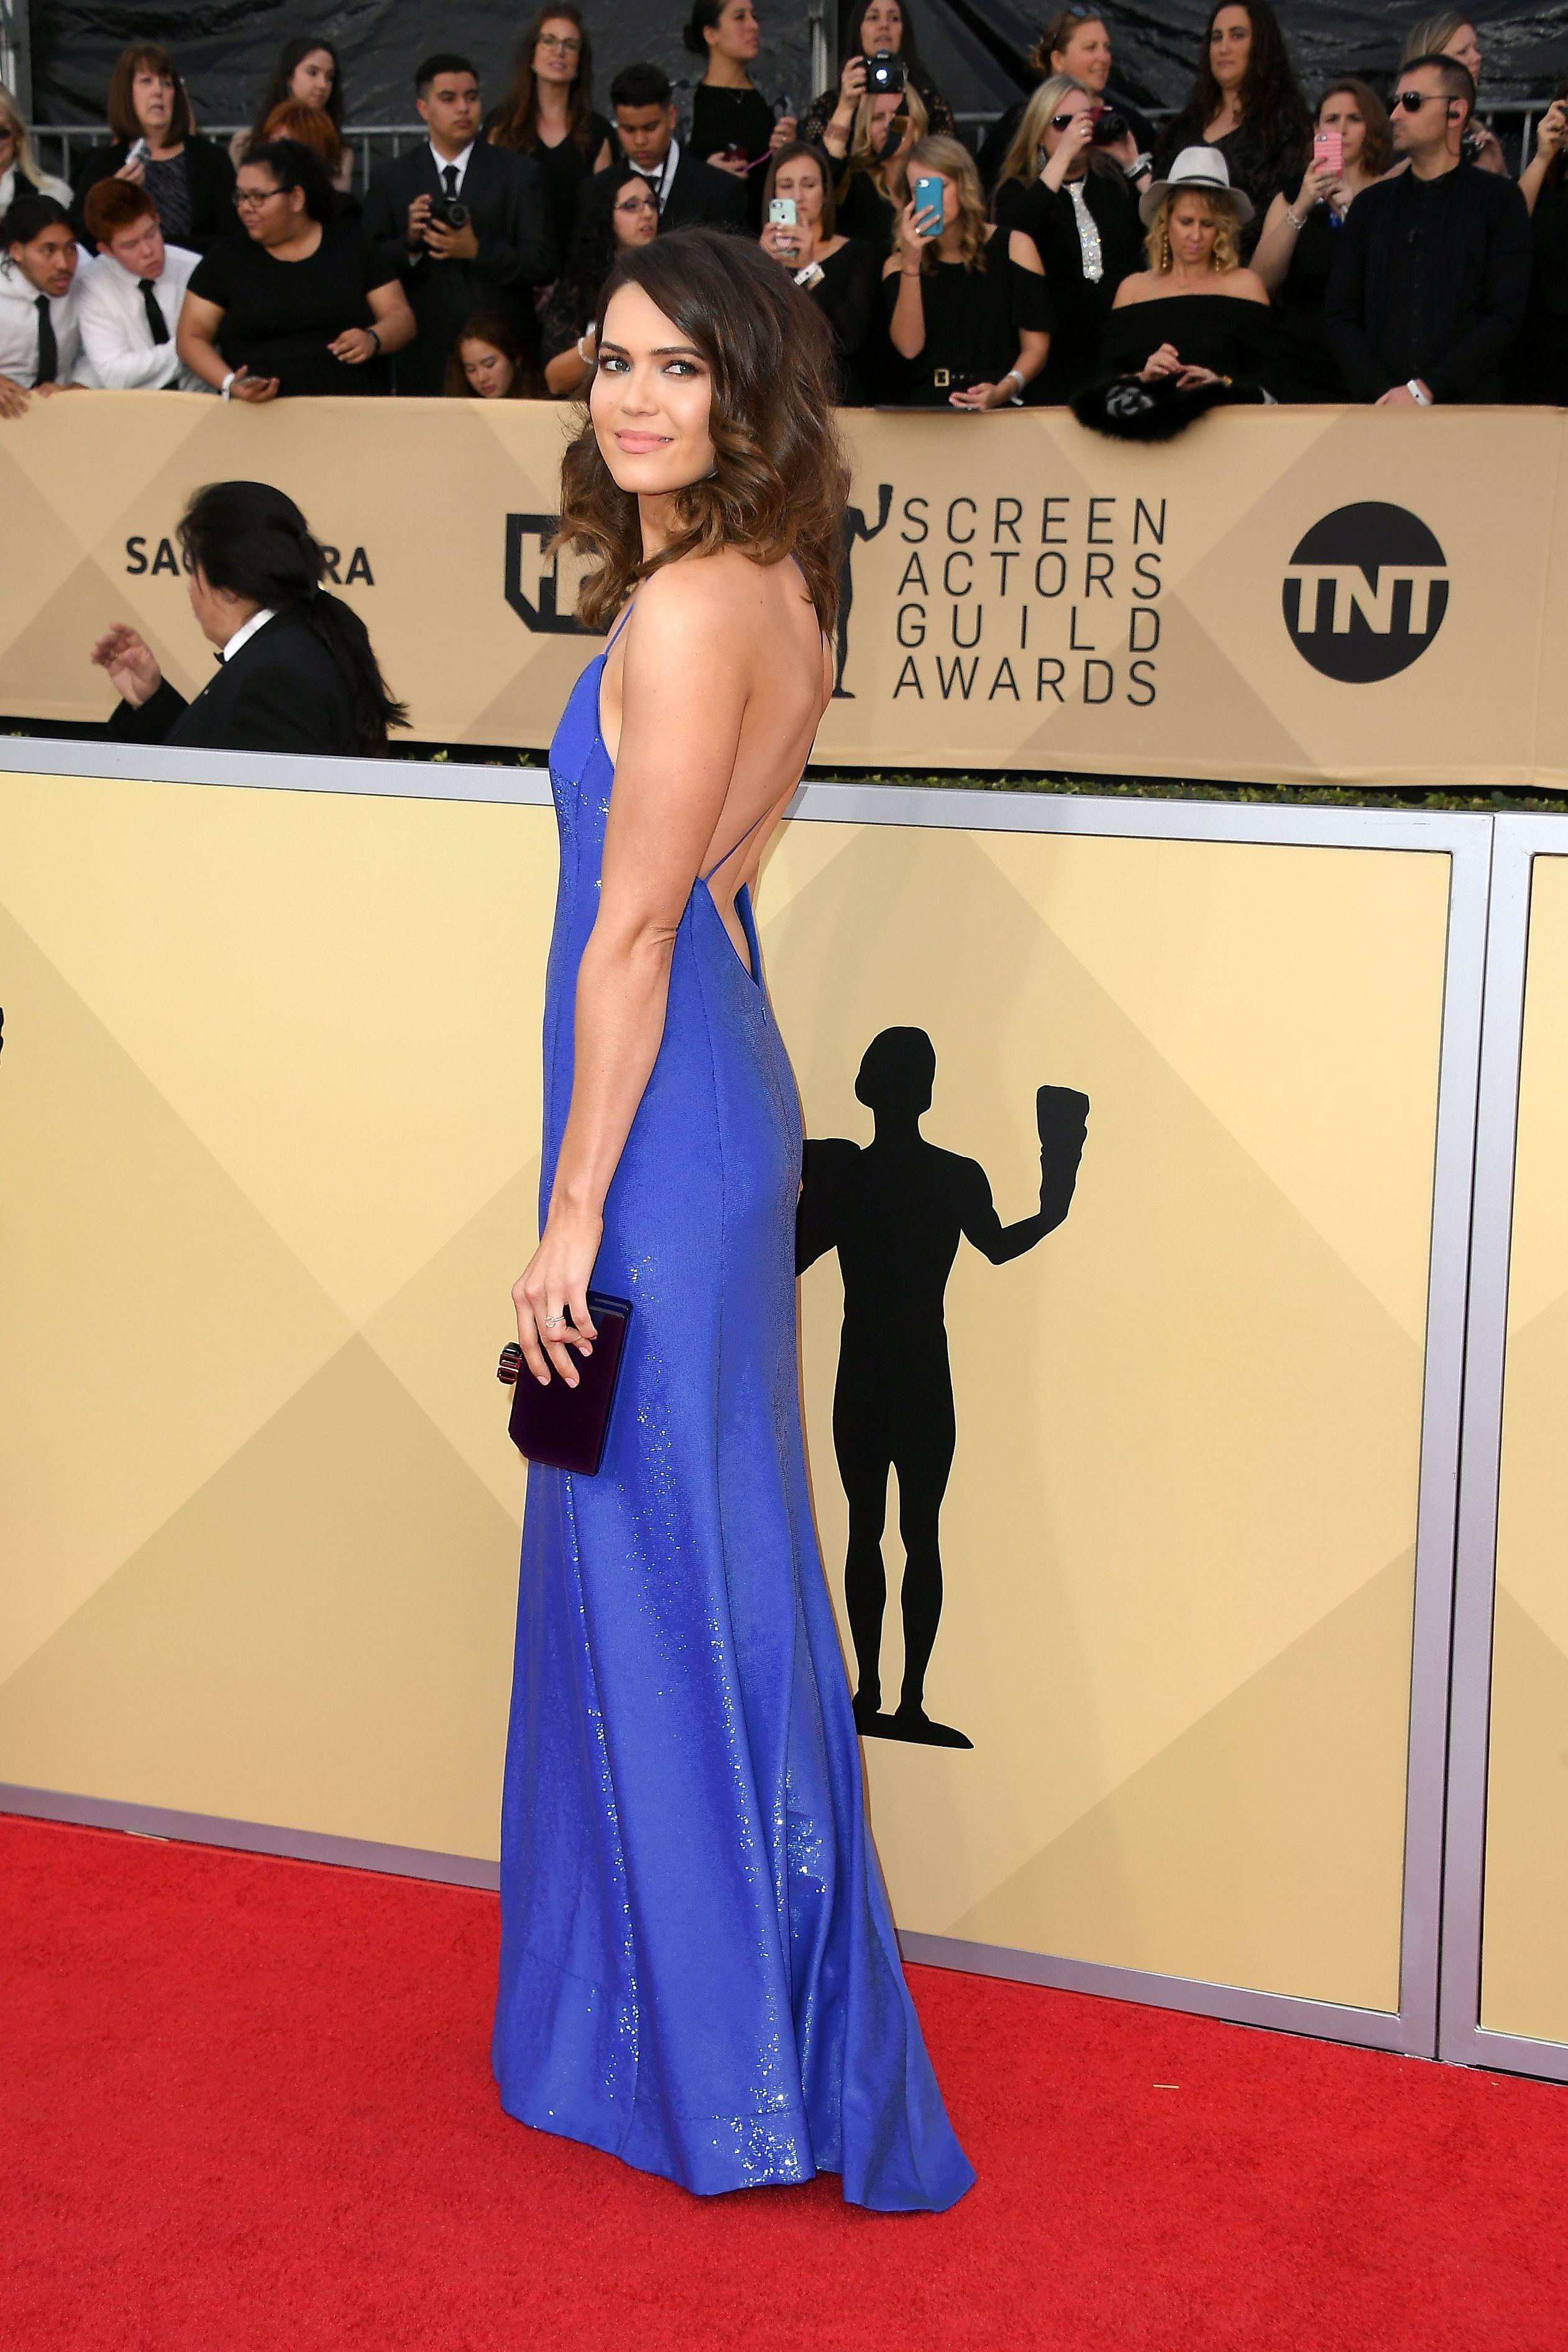 252480ffce8a Mandy Moore wearing a Ralph Lauren custom slip dress at the #SAGawards.